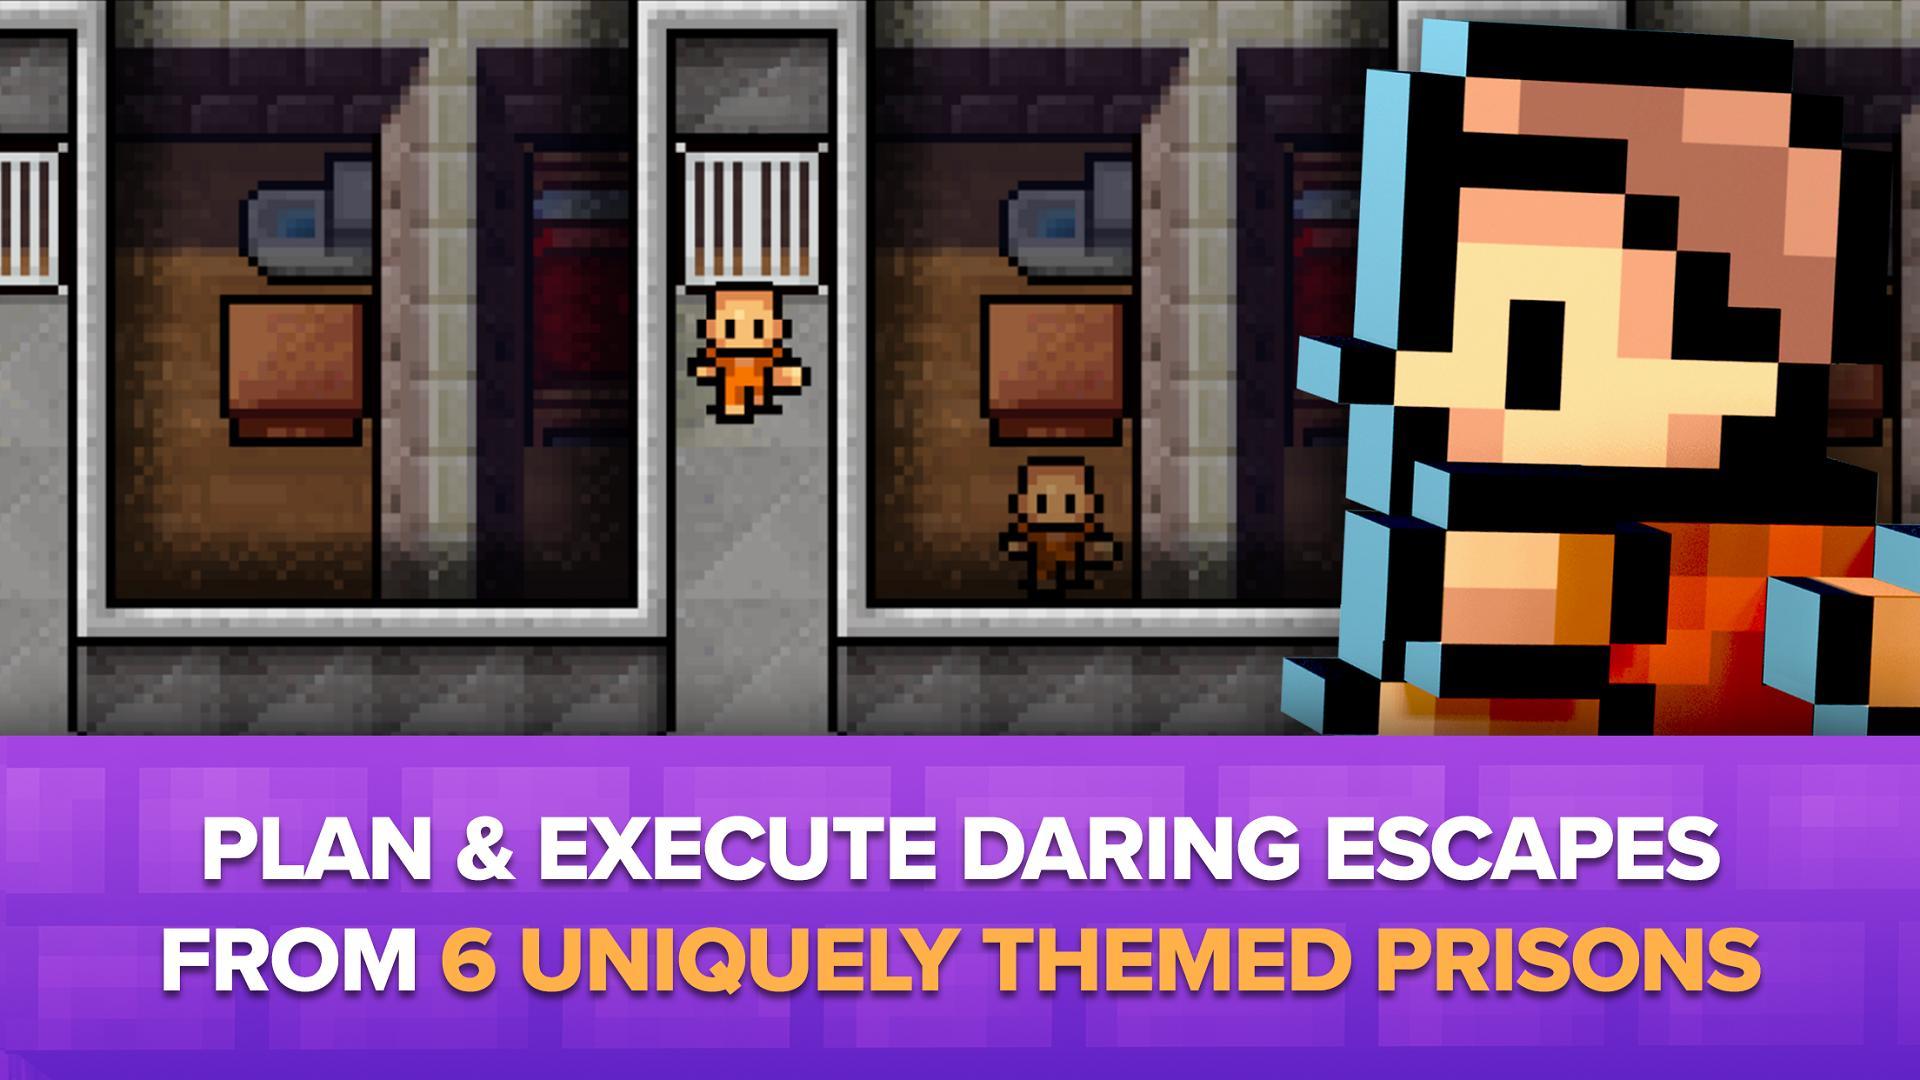 The Escapists: Prison Escape – Trial Edition 636064 Screenshot 2